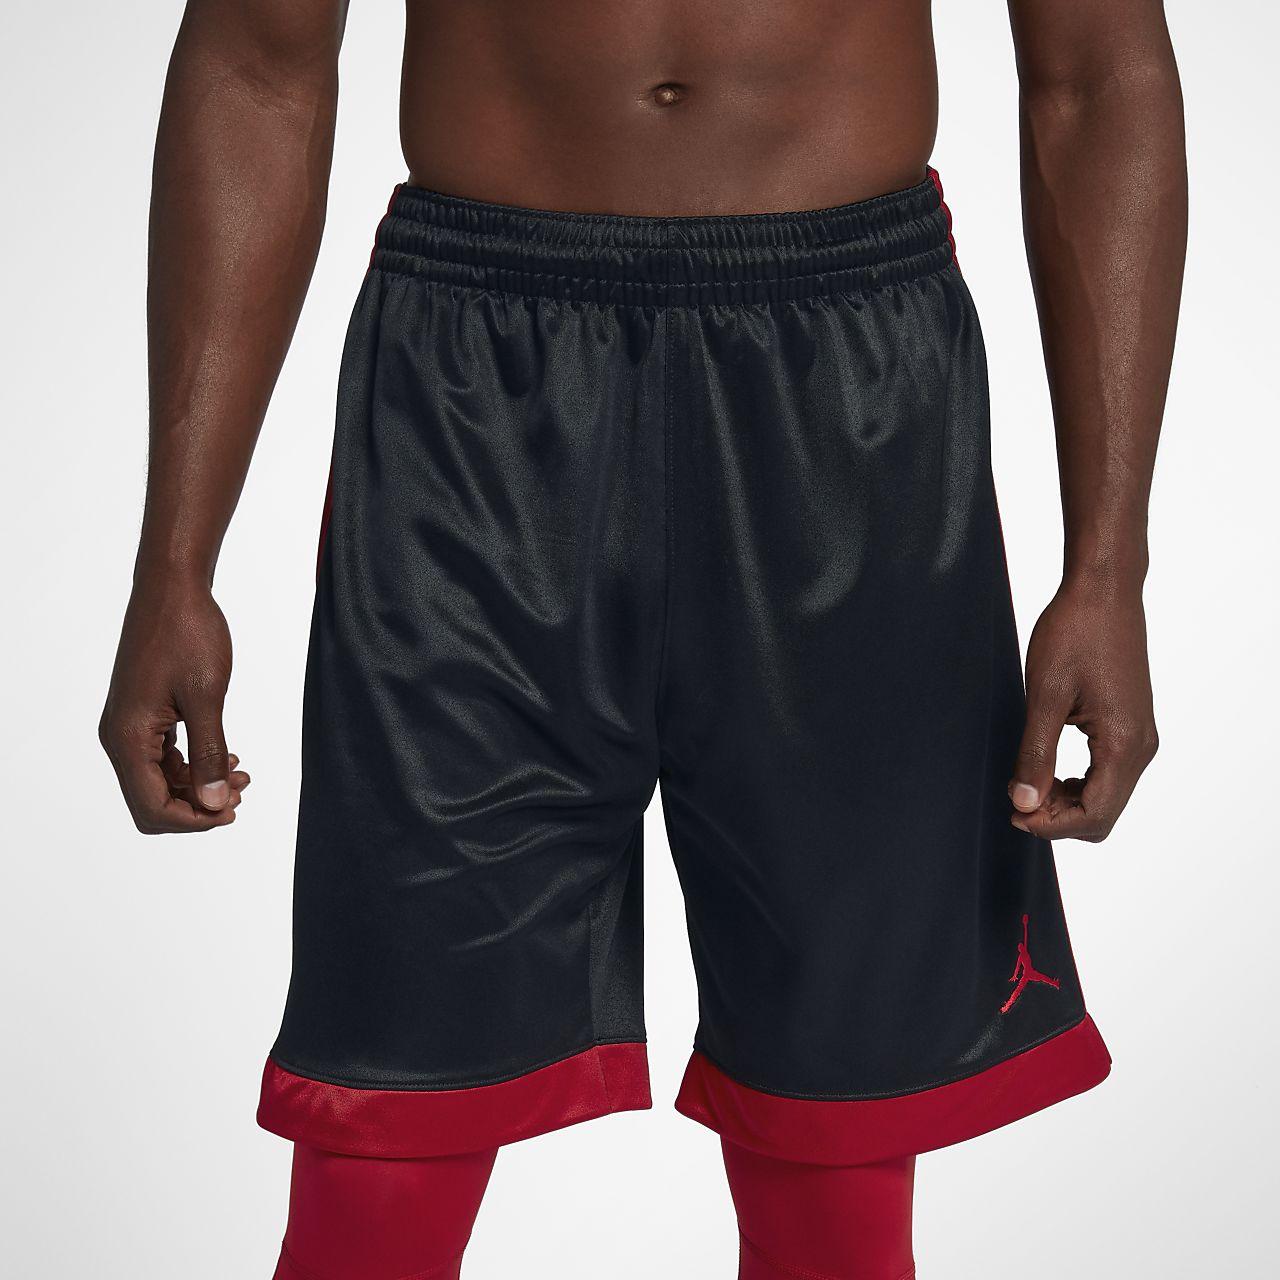 e29b8540a35 Low Resolution Jordan Shimmer Herren-Basketballshorts Jordan Shimmer  Herren-Basketballshorts